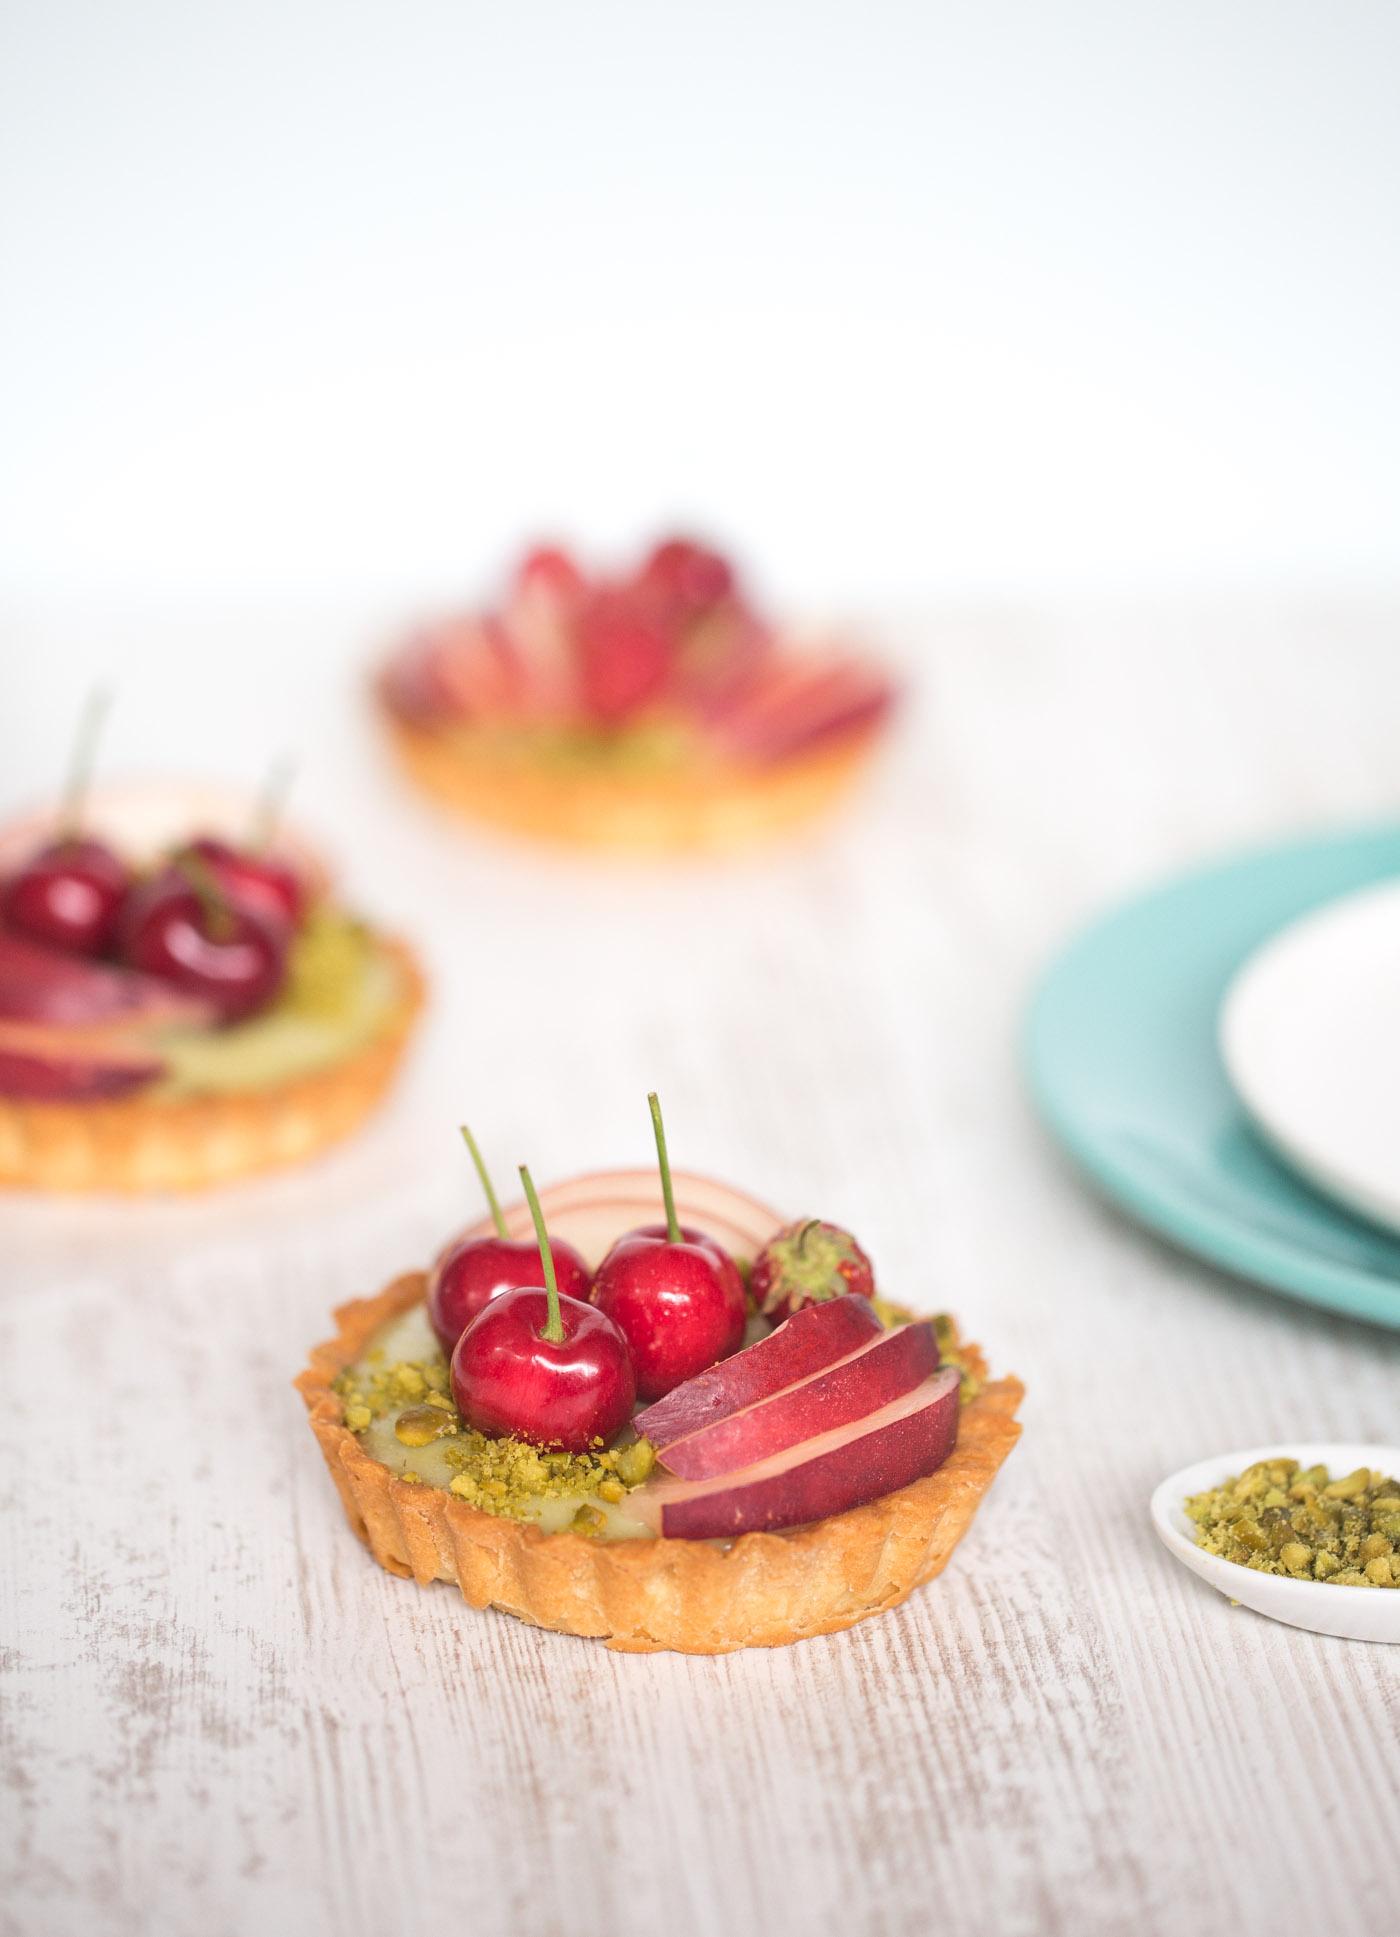 Blanccoco_Photographe_Tartelettes_pistache_fruits_styliste_culinaire-1